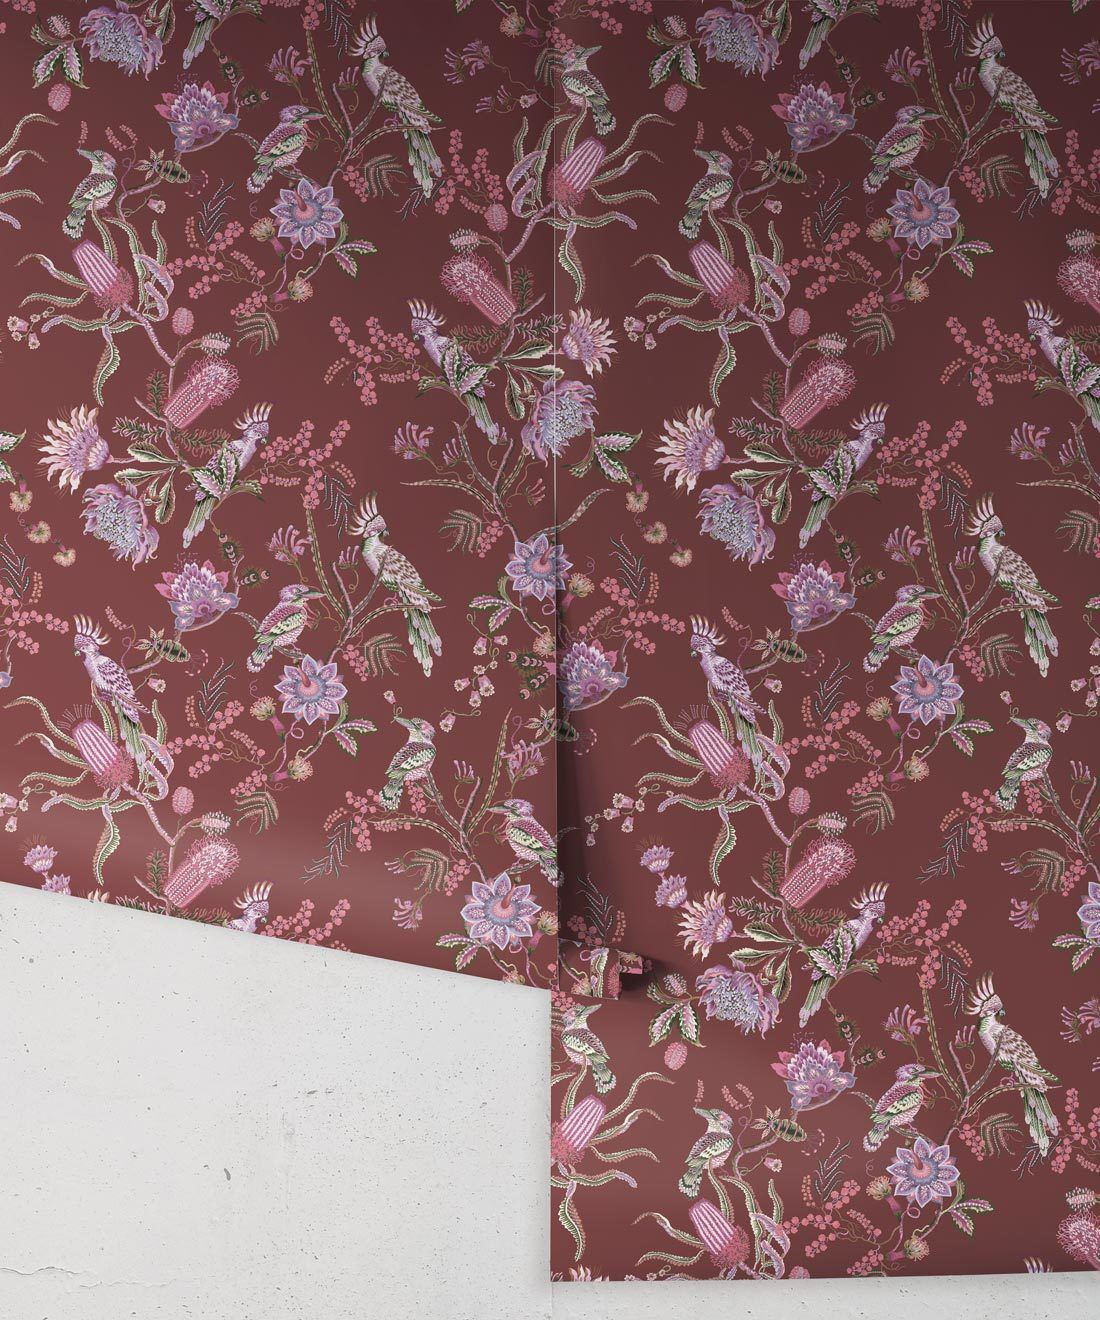 Matilda Wallpaper • Cockatoo, kookaburra • Australian Wallpaper • Milton & King USA • Plum Roll